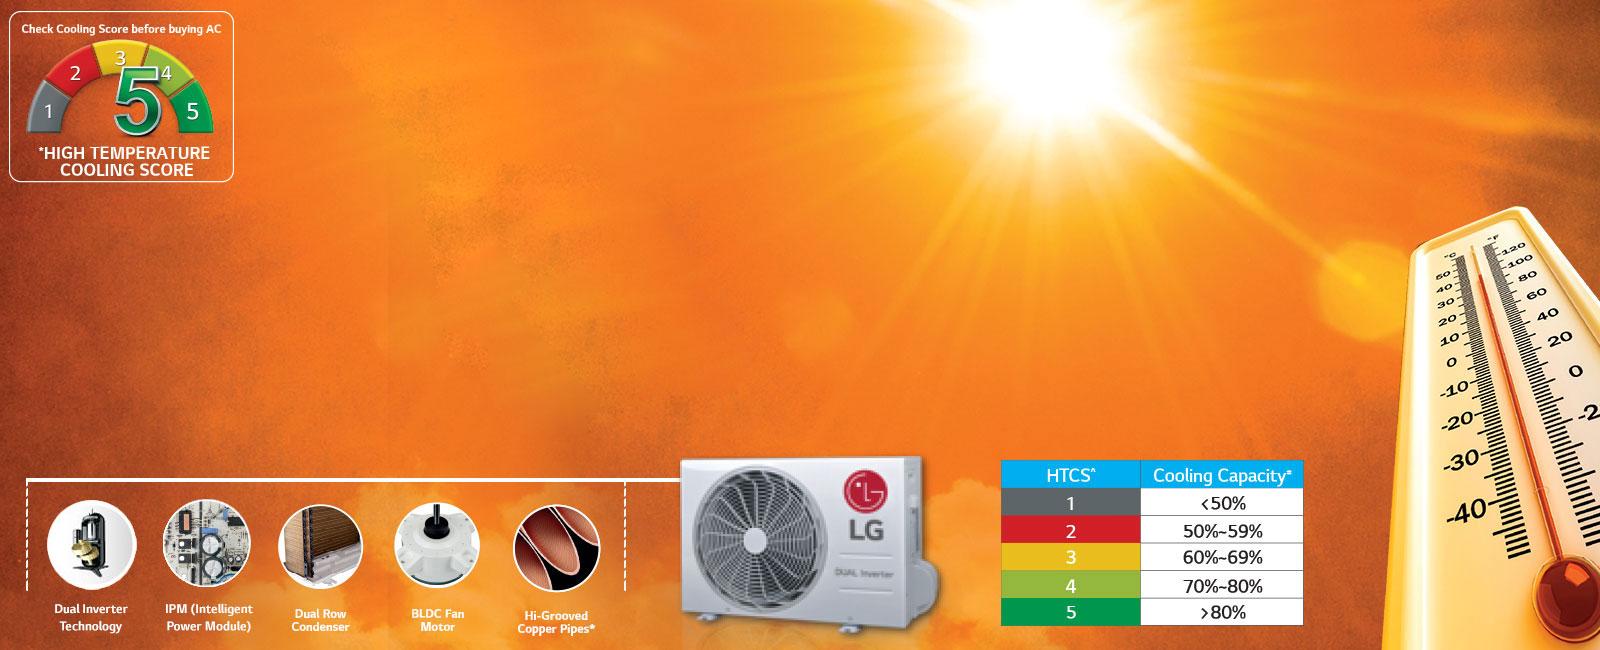 LG LS-Q18GWZA High Temperature Cooling Score